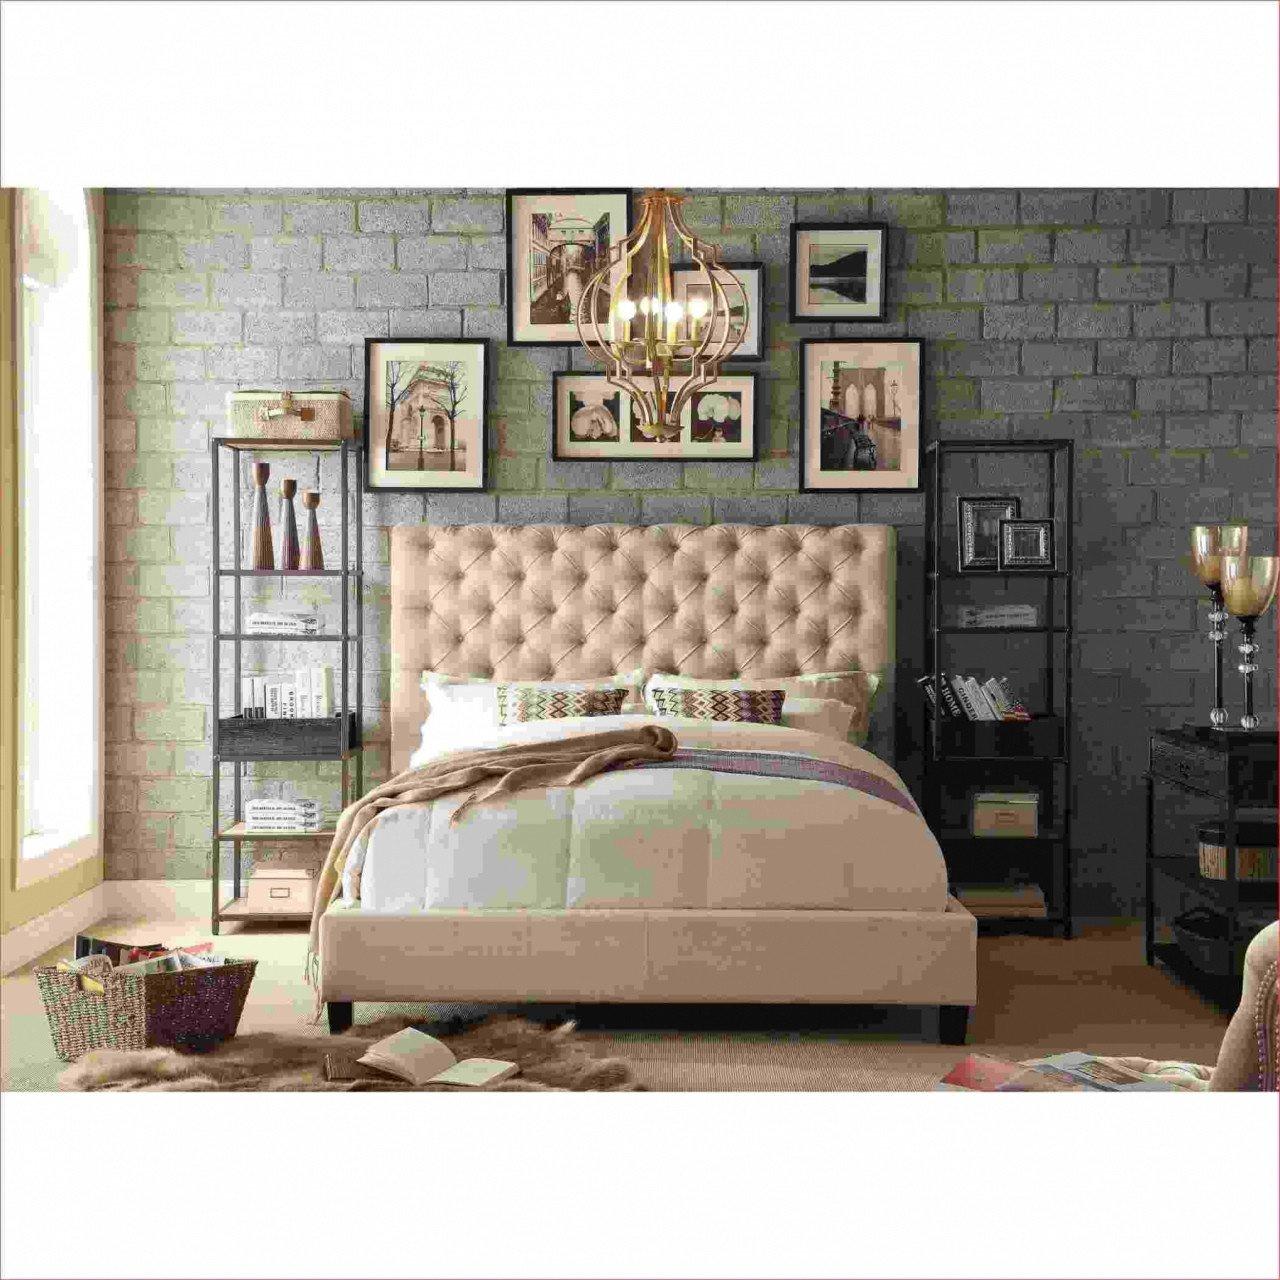 Solid Oak Bedroom Furniture Beautiful solid Wood Bedroom Furniture — Procura Home Blog